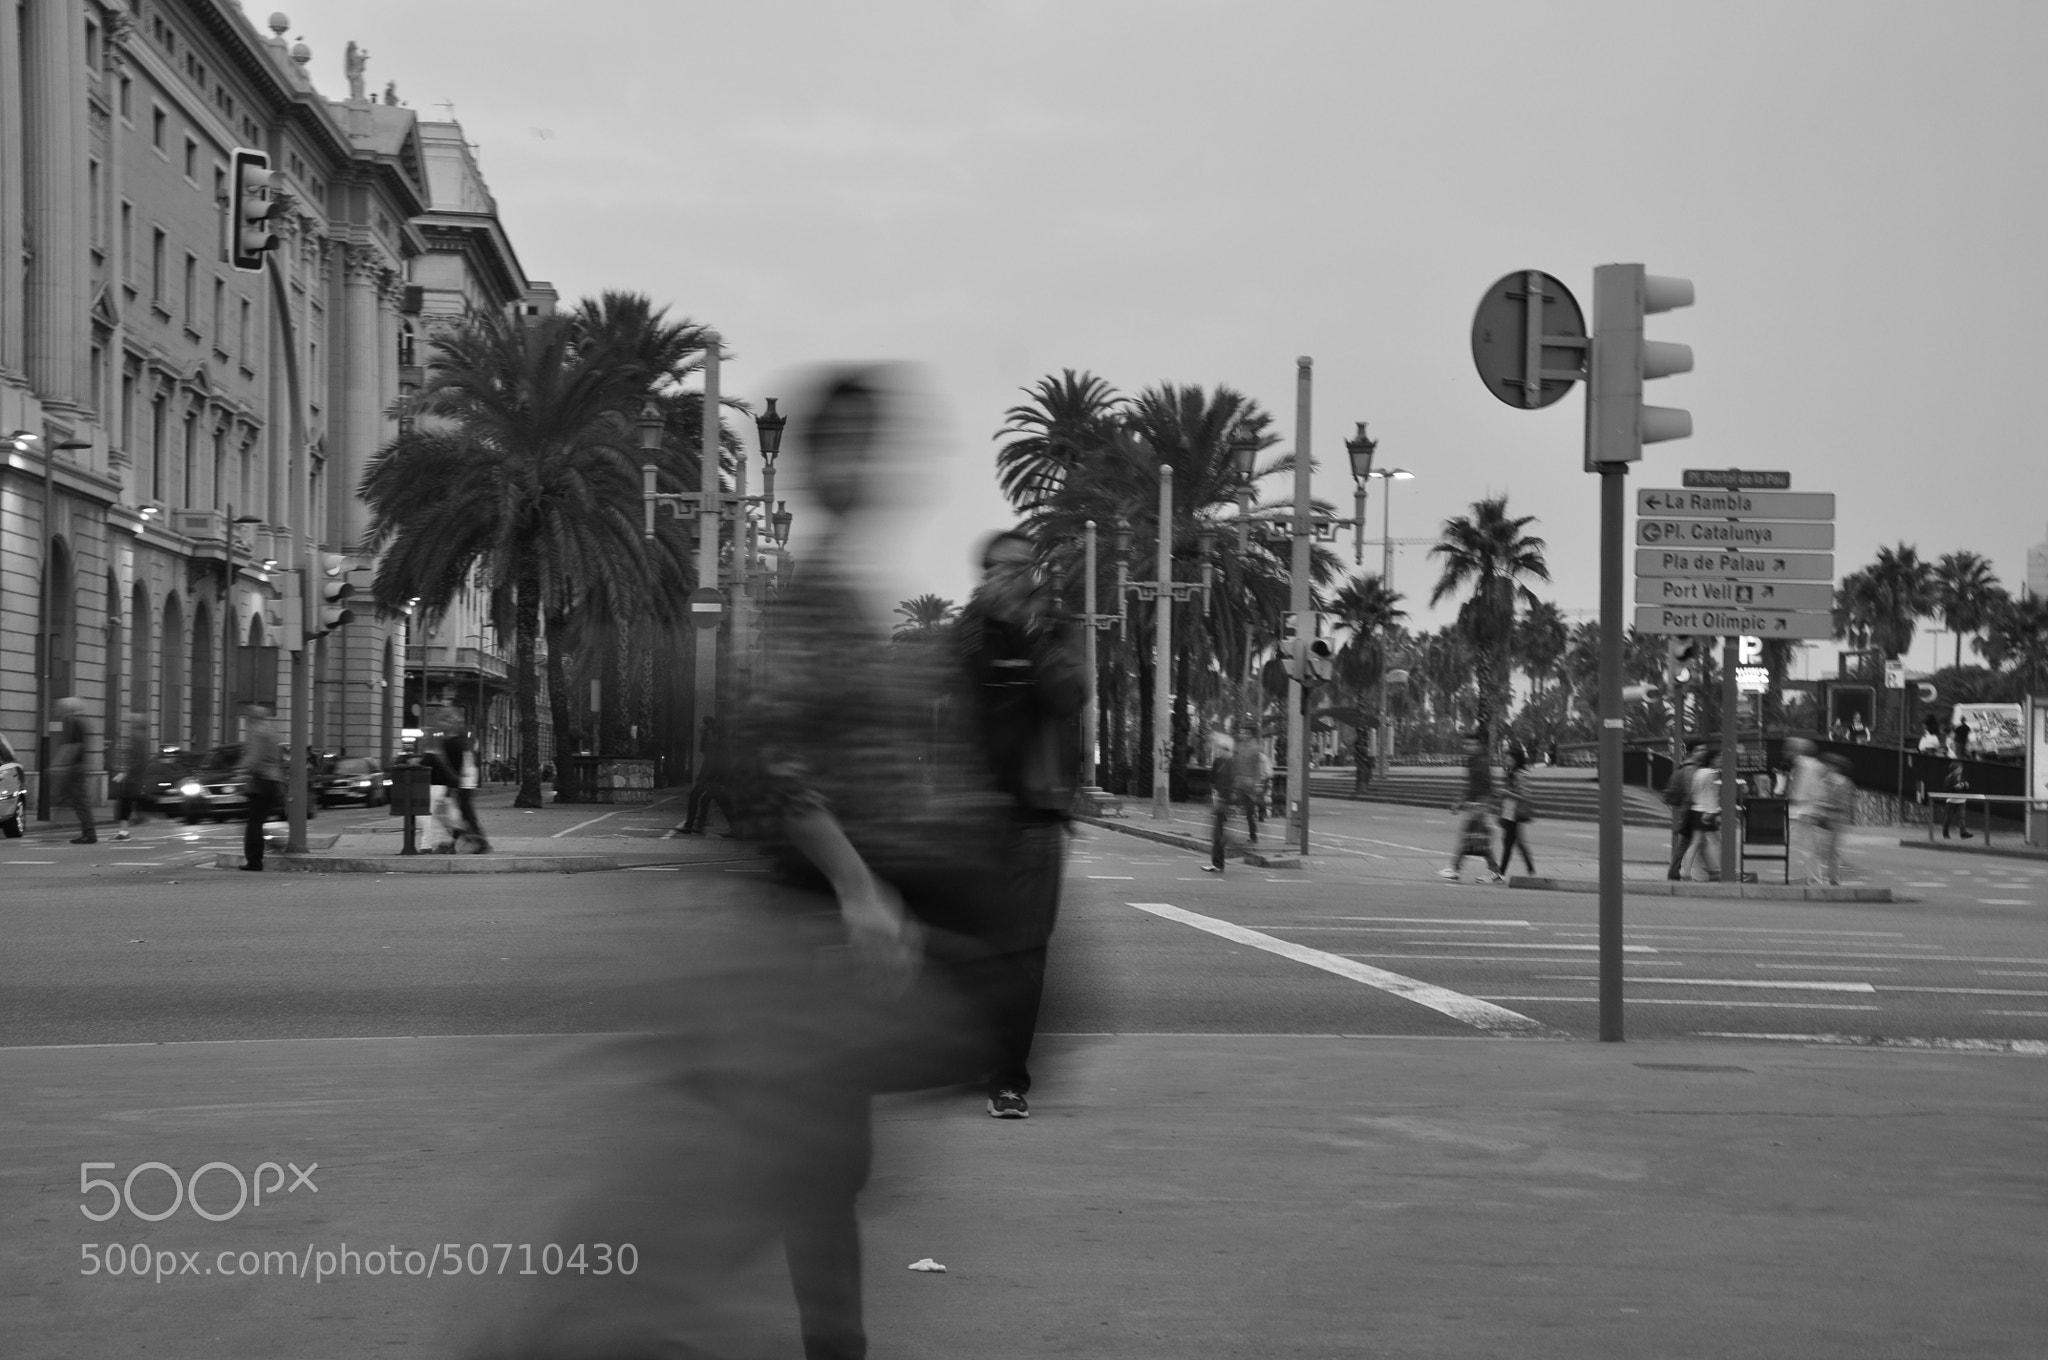 Photograph No direction home by Nelya Ihoshyna on 500px